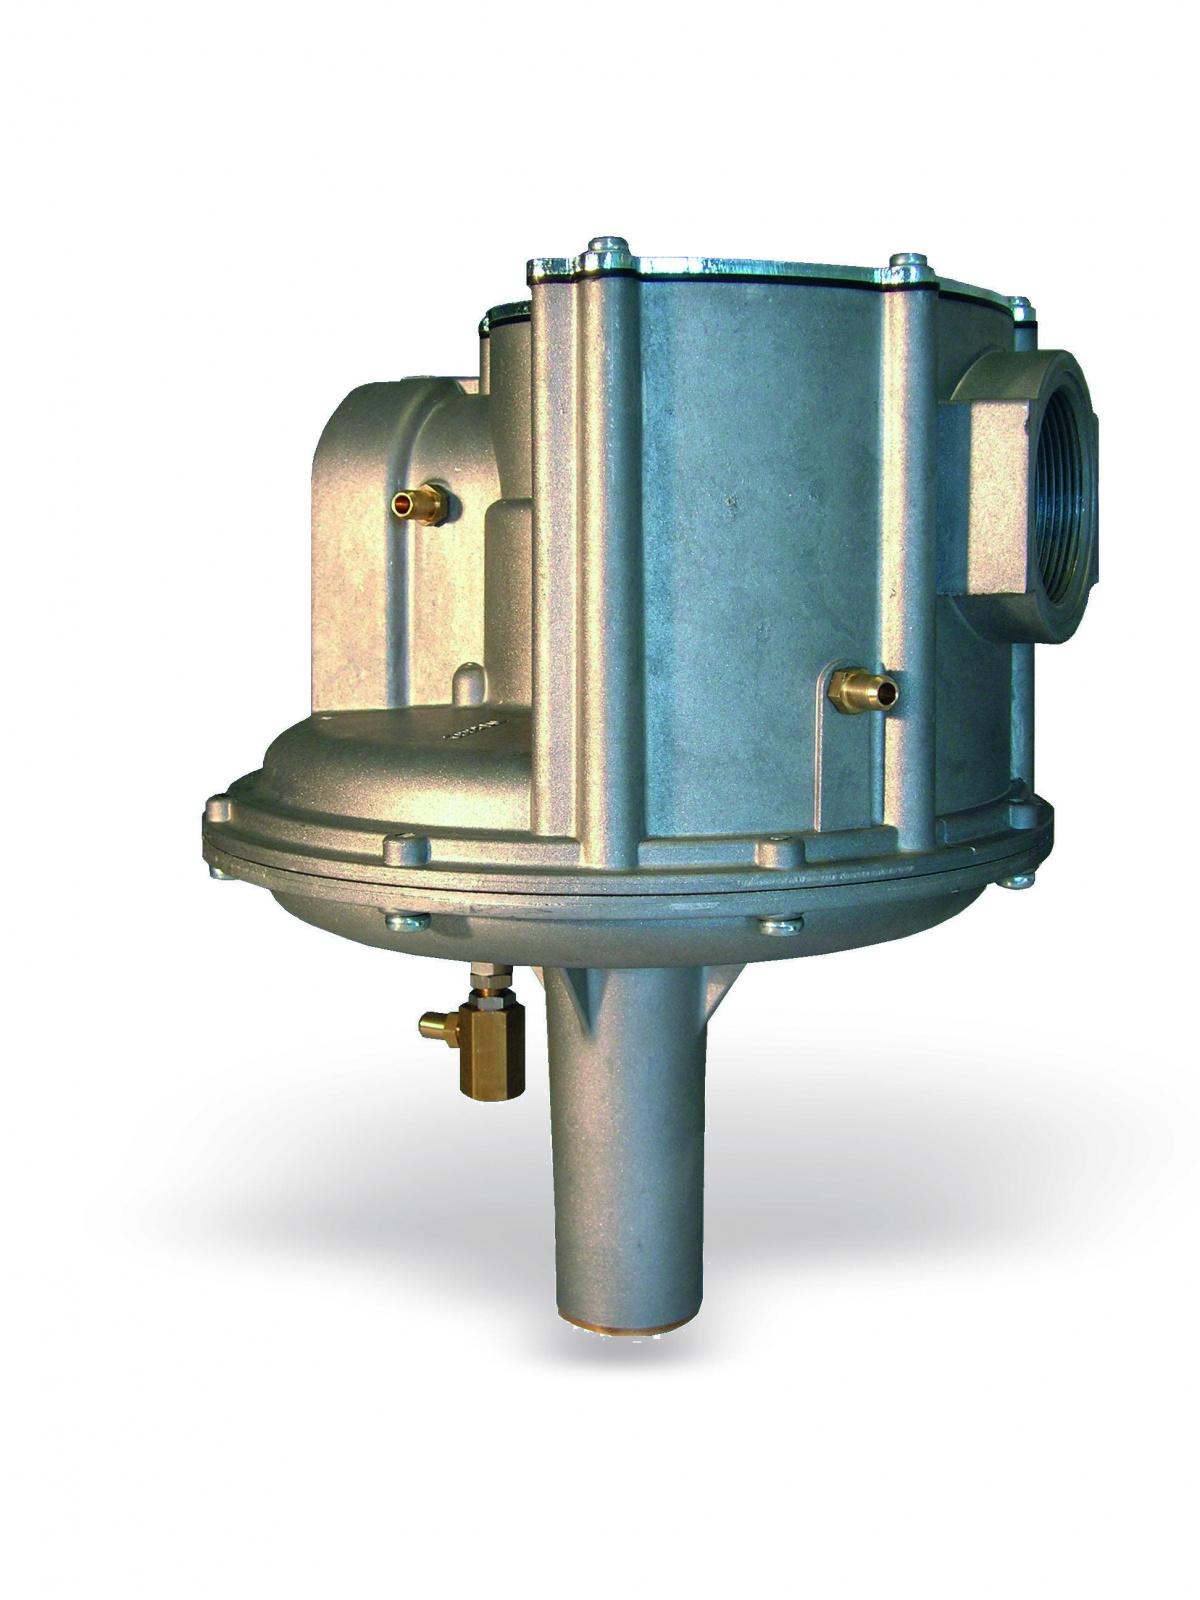 Air-gas ratio control valve GAVR